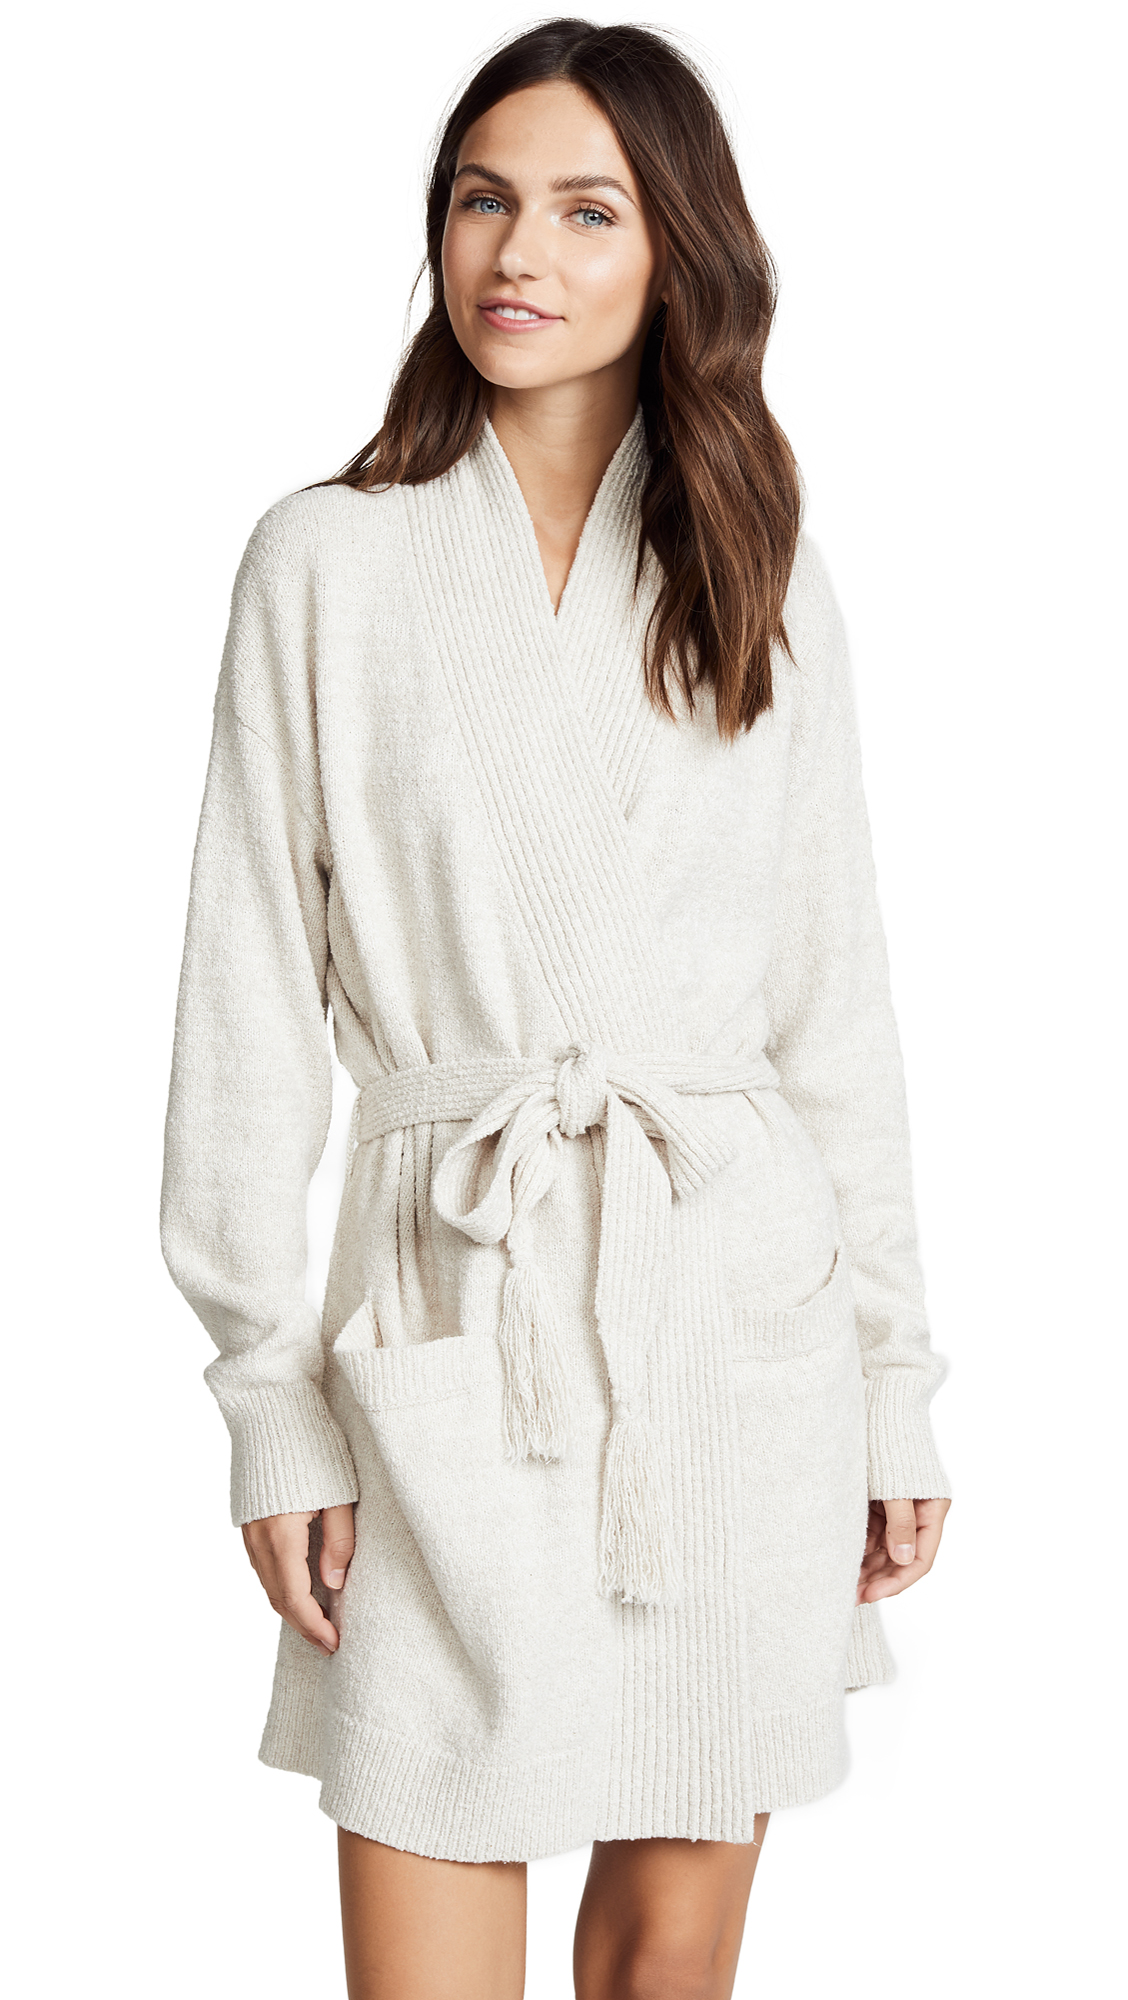 Skin Fiona Wrap Robe In White Sand